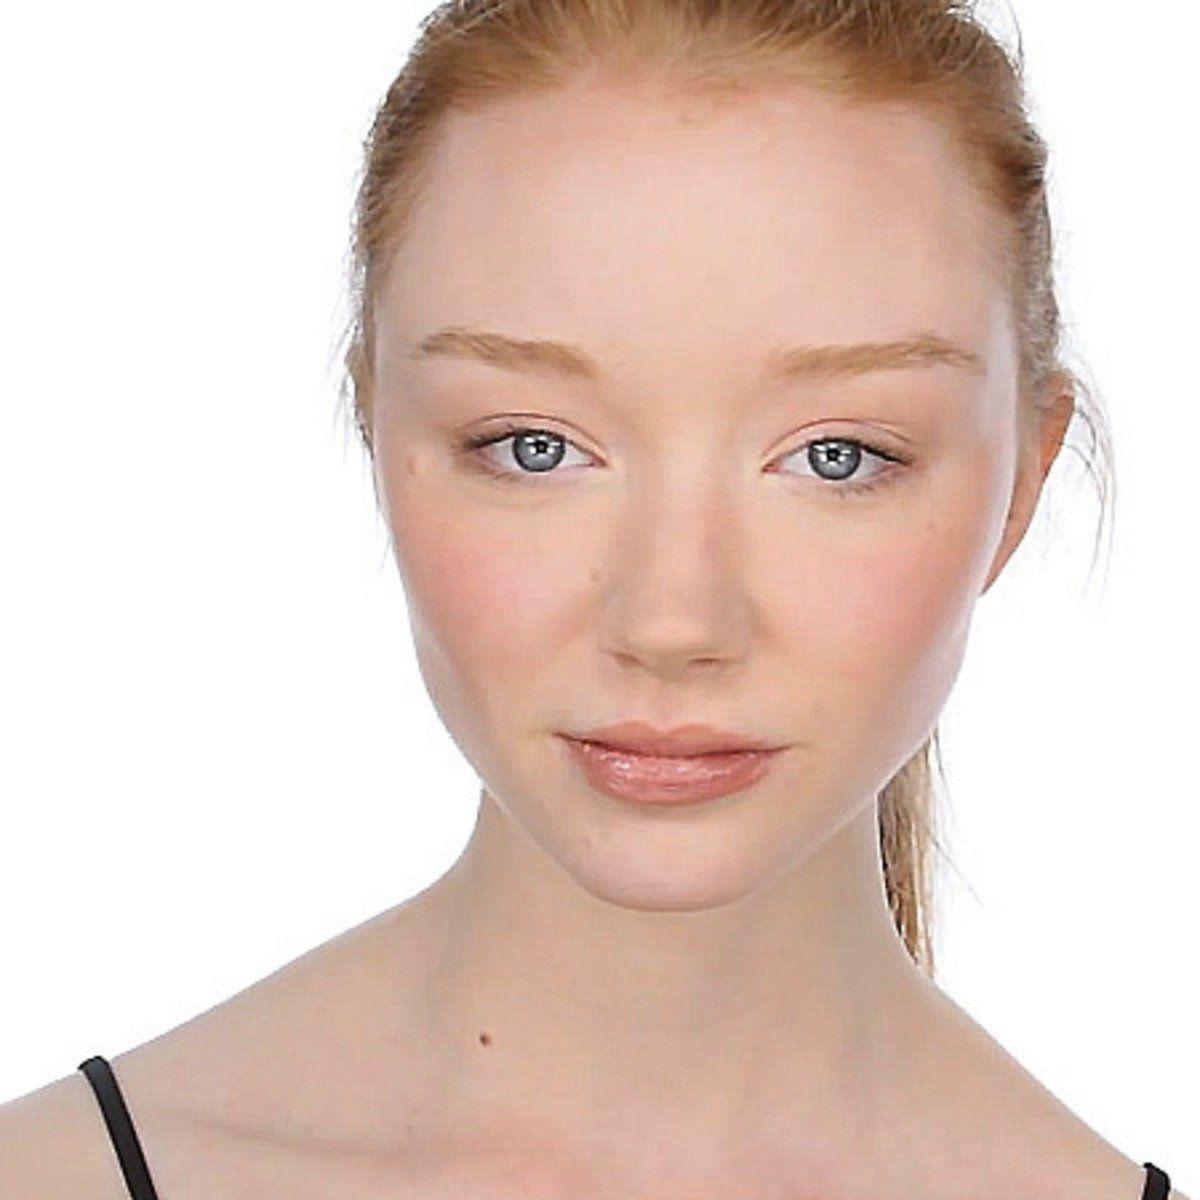 makeup-gallery-makeup-tutorial-fair-skin-and-brown-eyes-fair-beauty